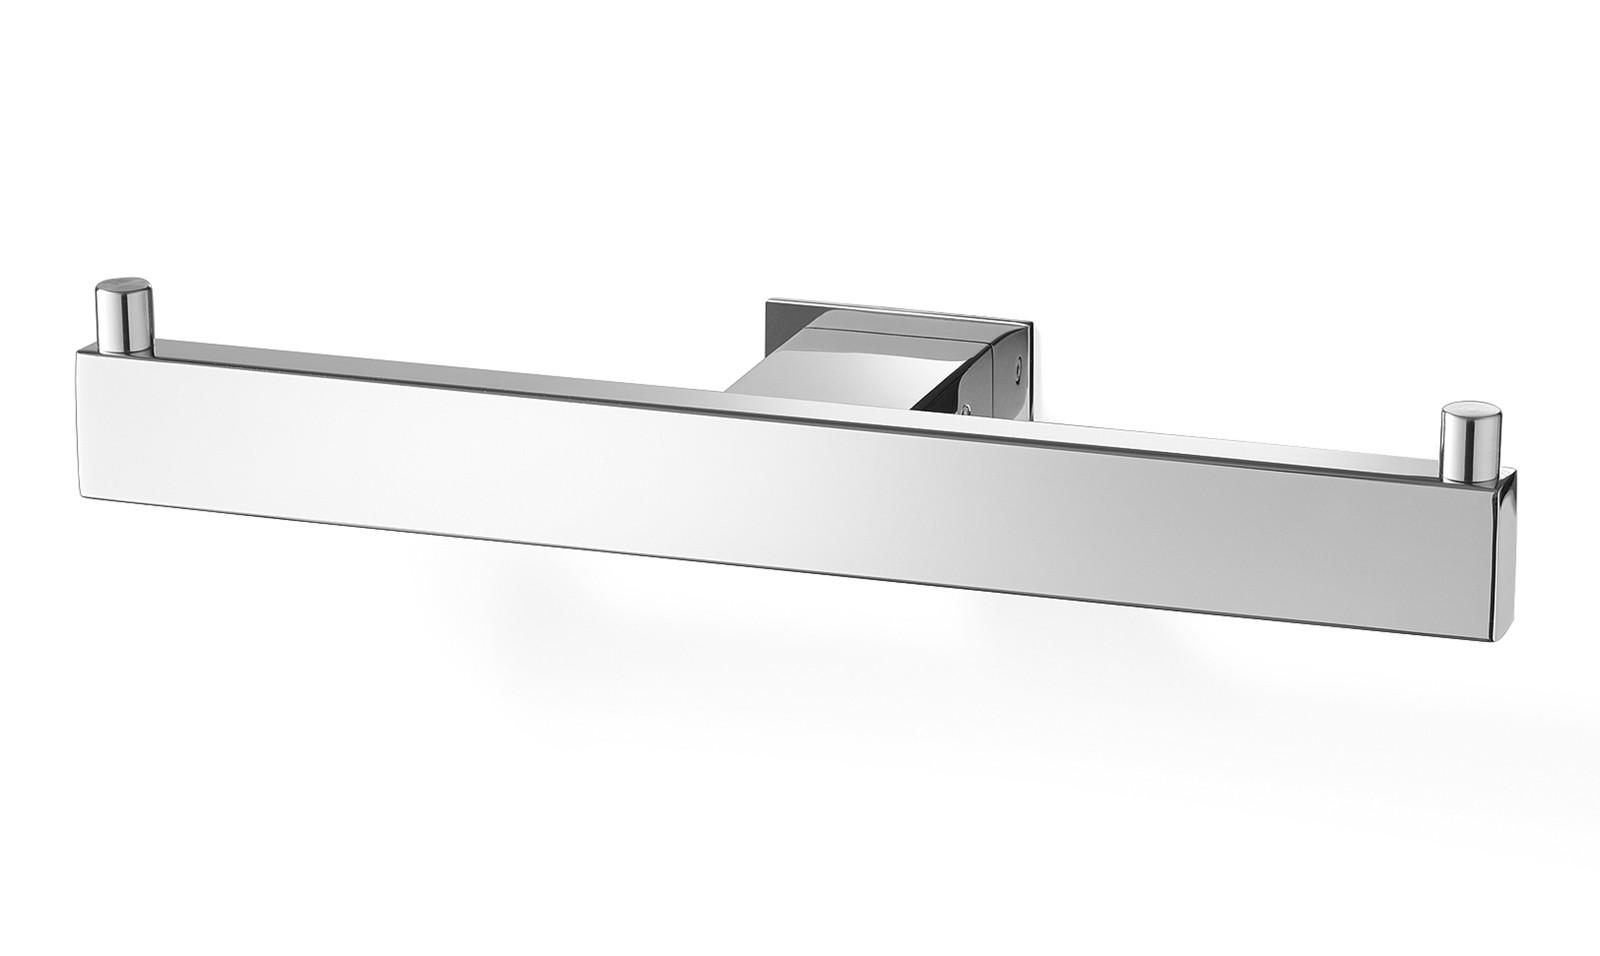 zack edelstahl doppel toilettenpapierhalter wc rollenhalter linea poliert 40022 bad bad. Black Bedroom Furniture Sets. Home Design Ideas